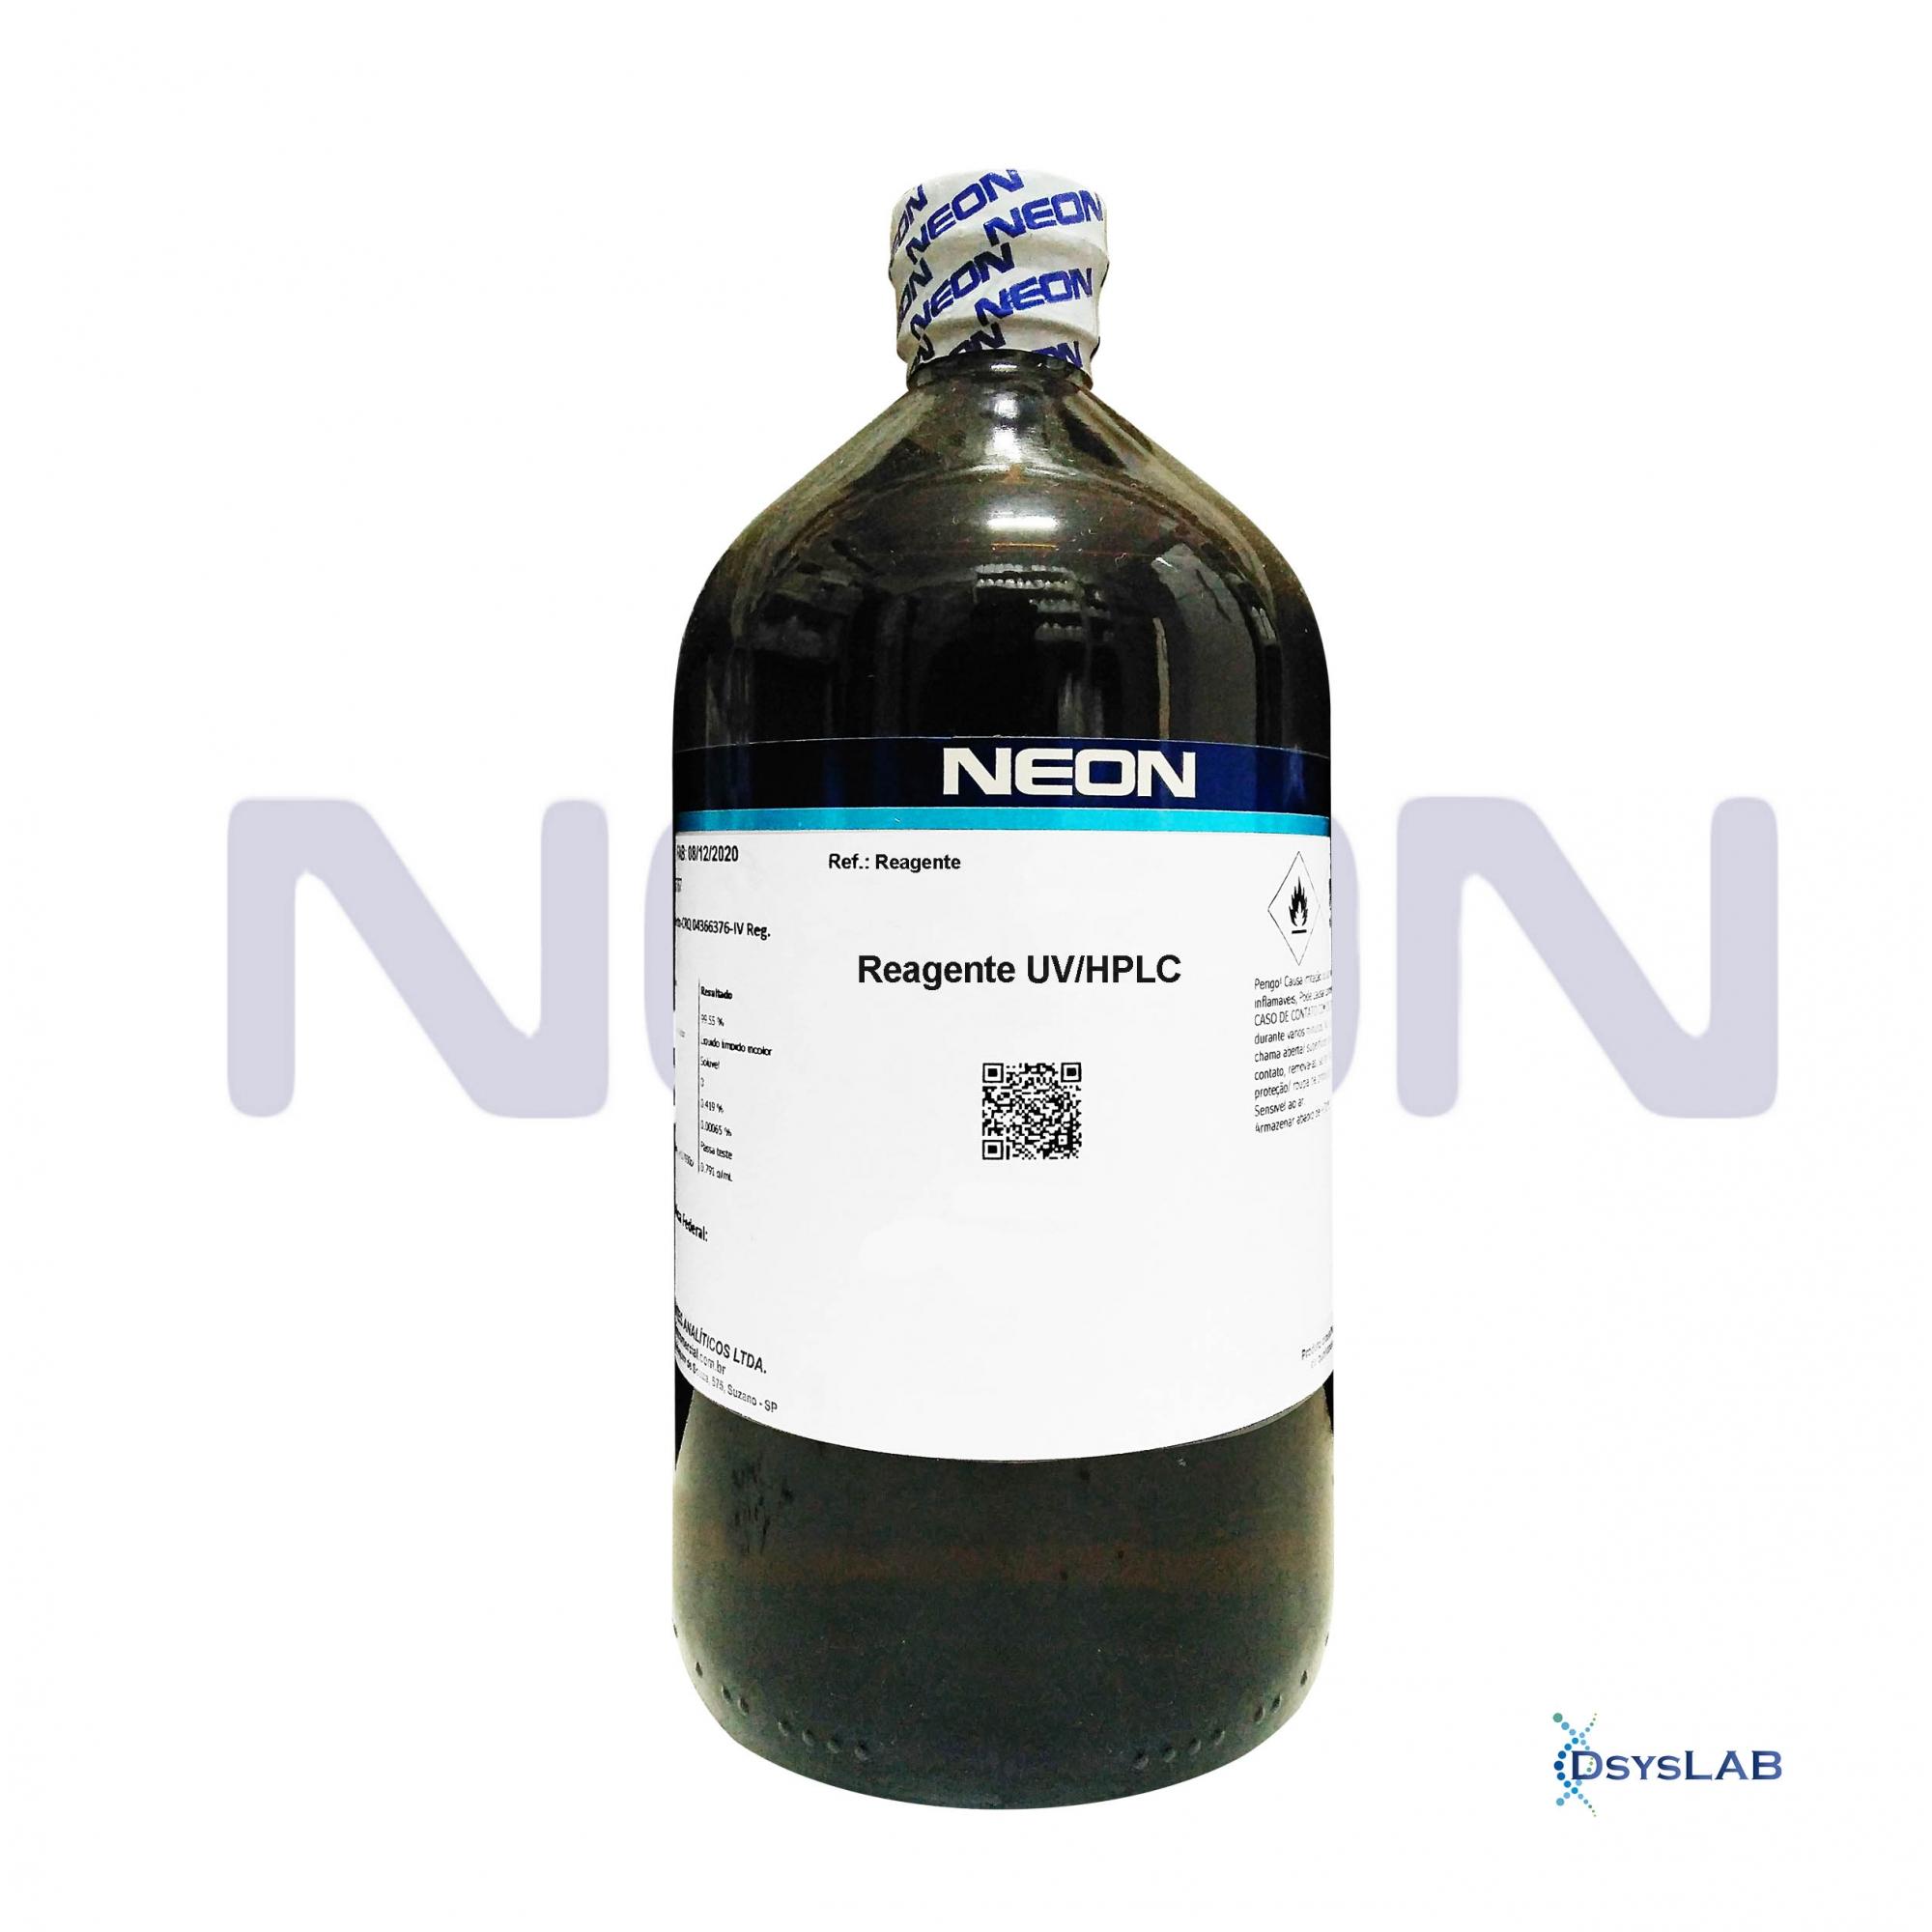 Álcool Metílico 99,8% UV/HPLC CAS 67-56-1  NEON